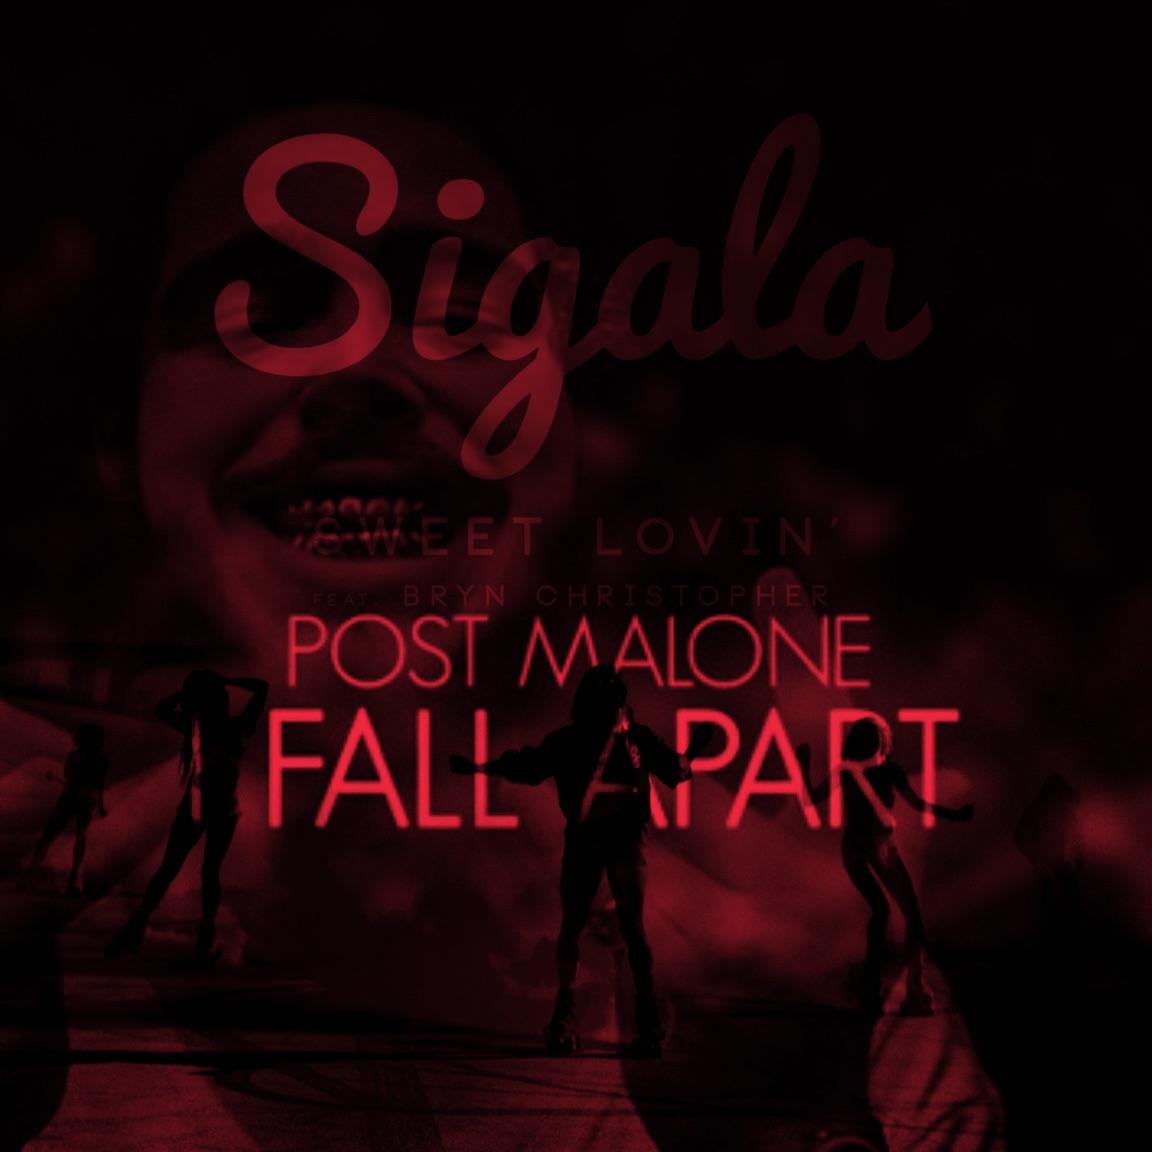 Post Malone Hit This Hard: Sweet Lovin Fall Apart (Voan Mashup